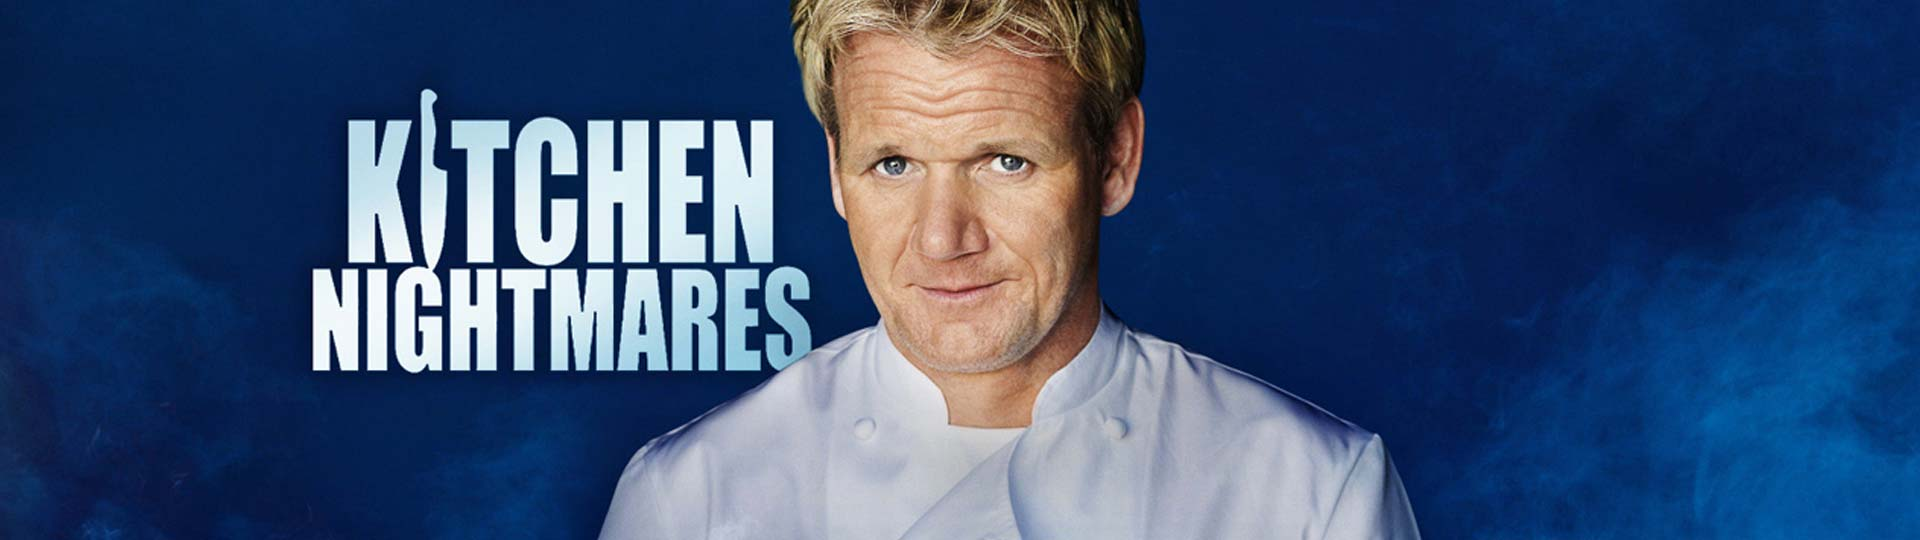 Amys Baking Company Kitchen Nightmares Return Not